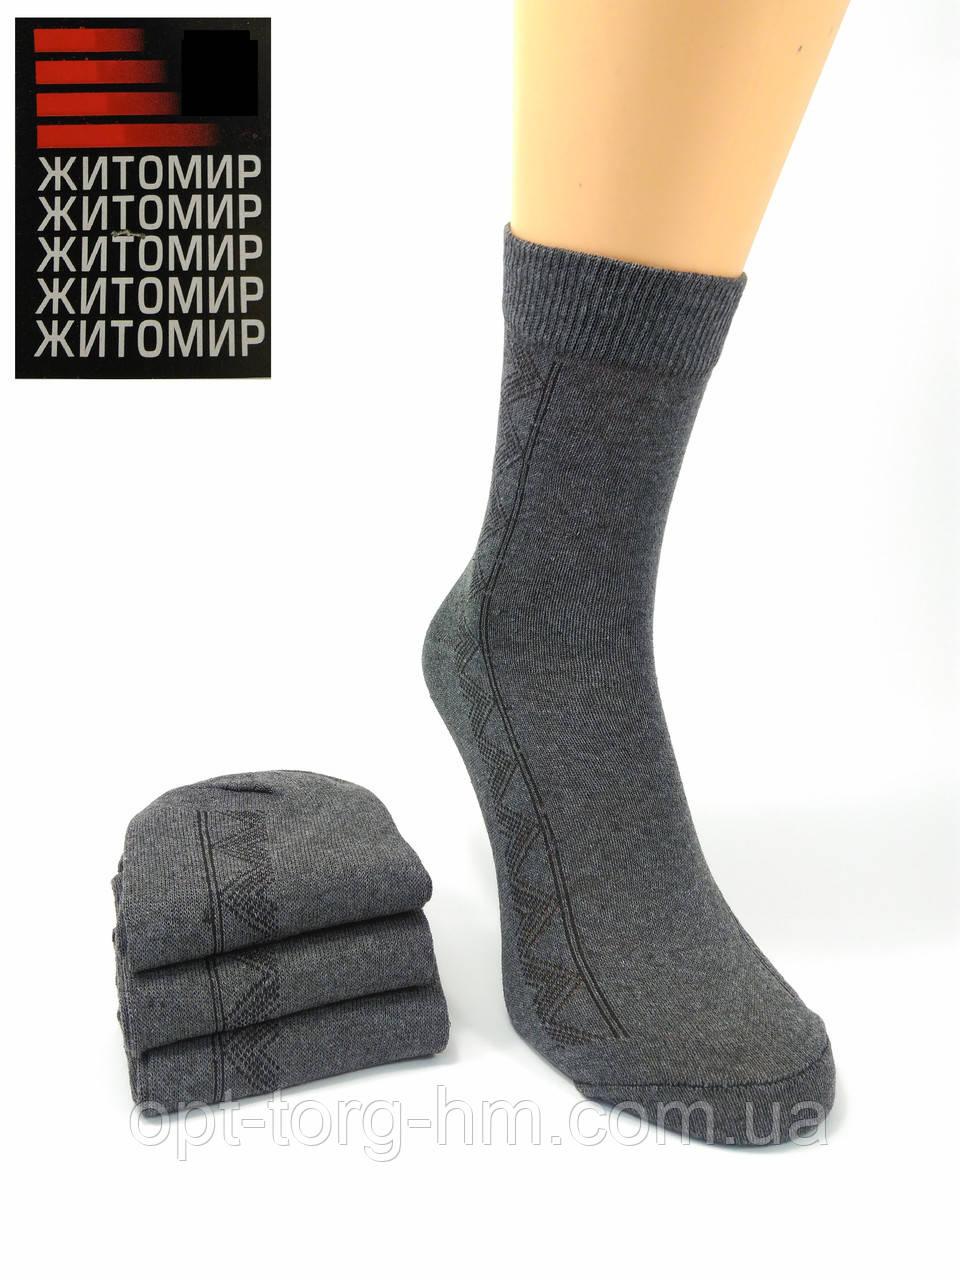 Мужские носки х/б темно серые  25 (39-40)